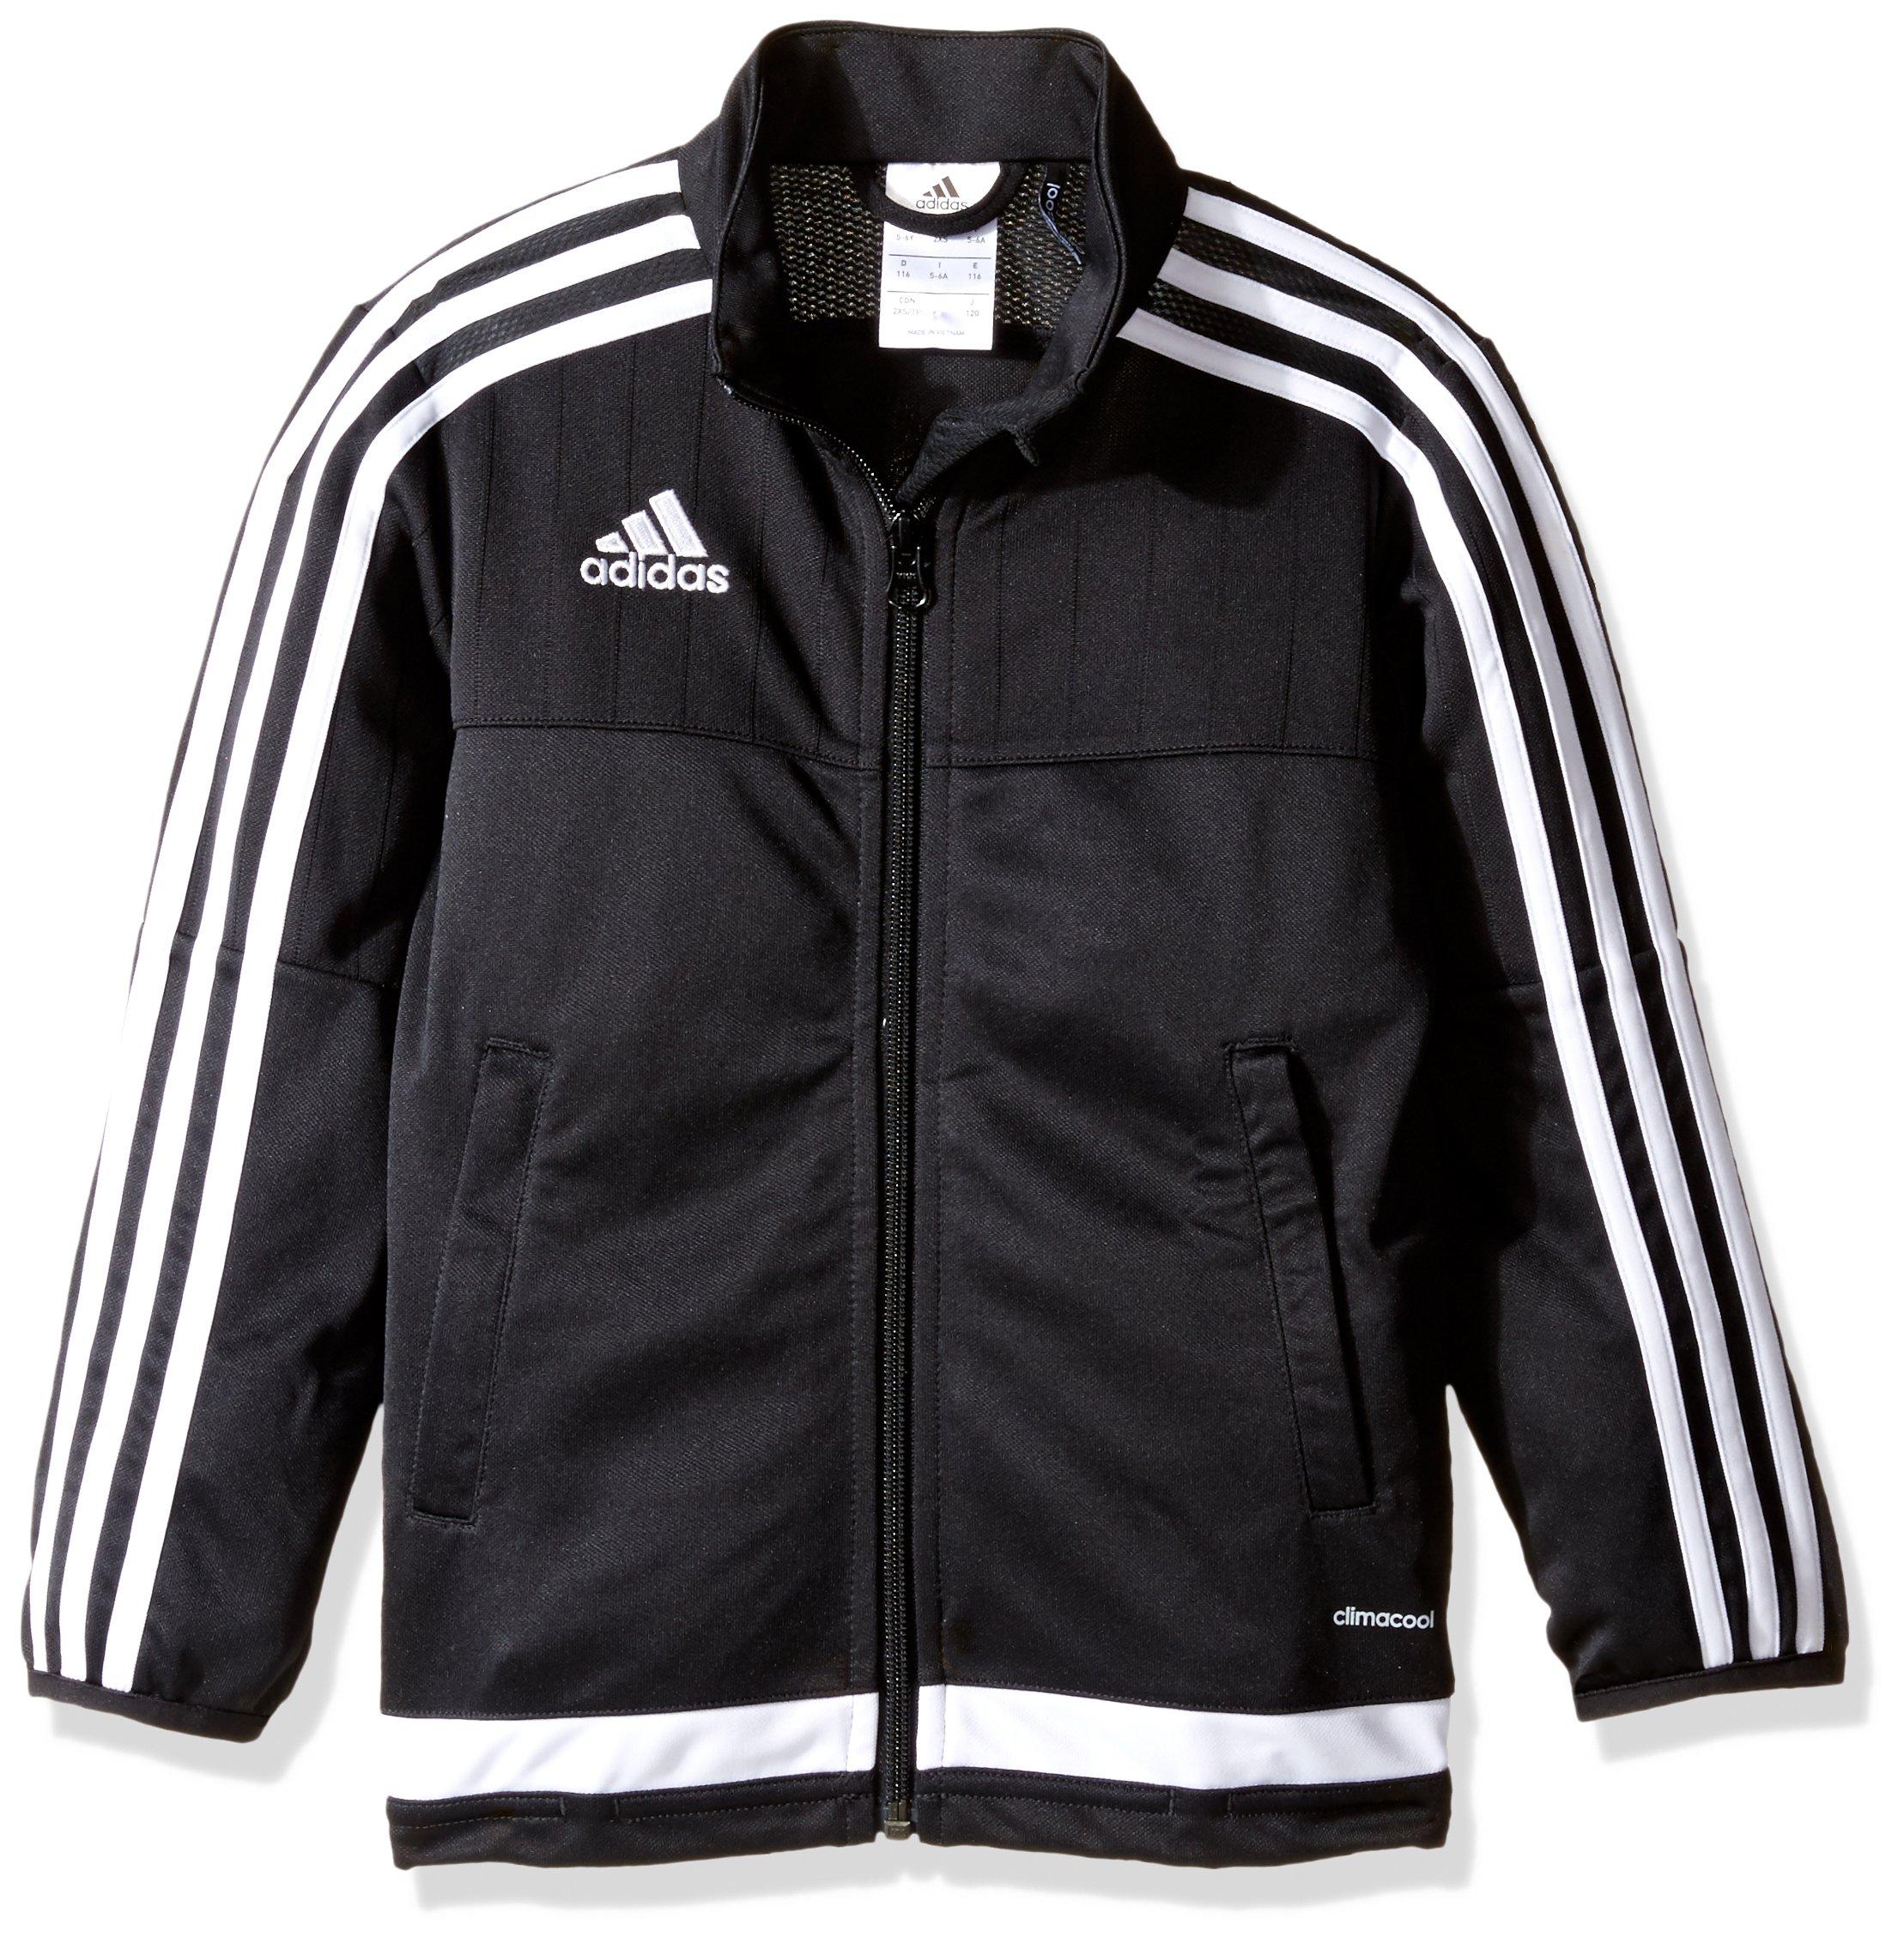 adidas Kids' Soccer Tiro 15 Training Jacket, White/Black, Small by adidas